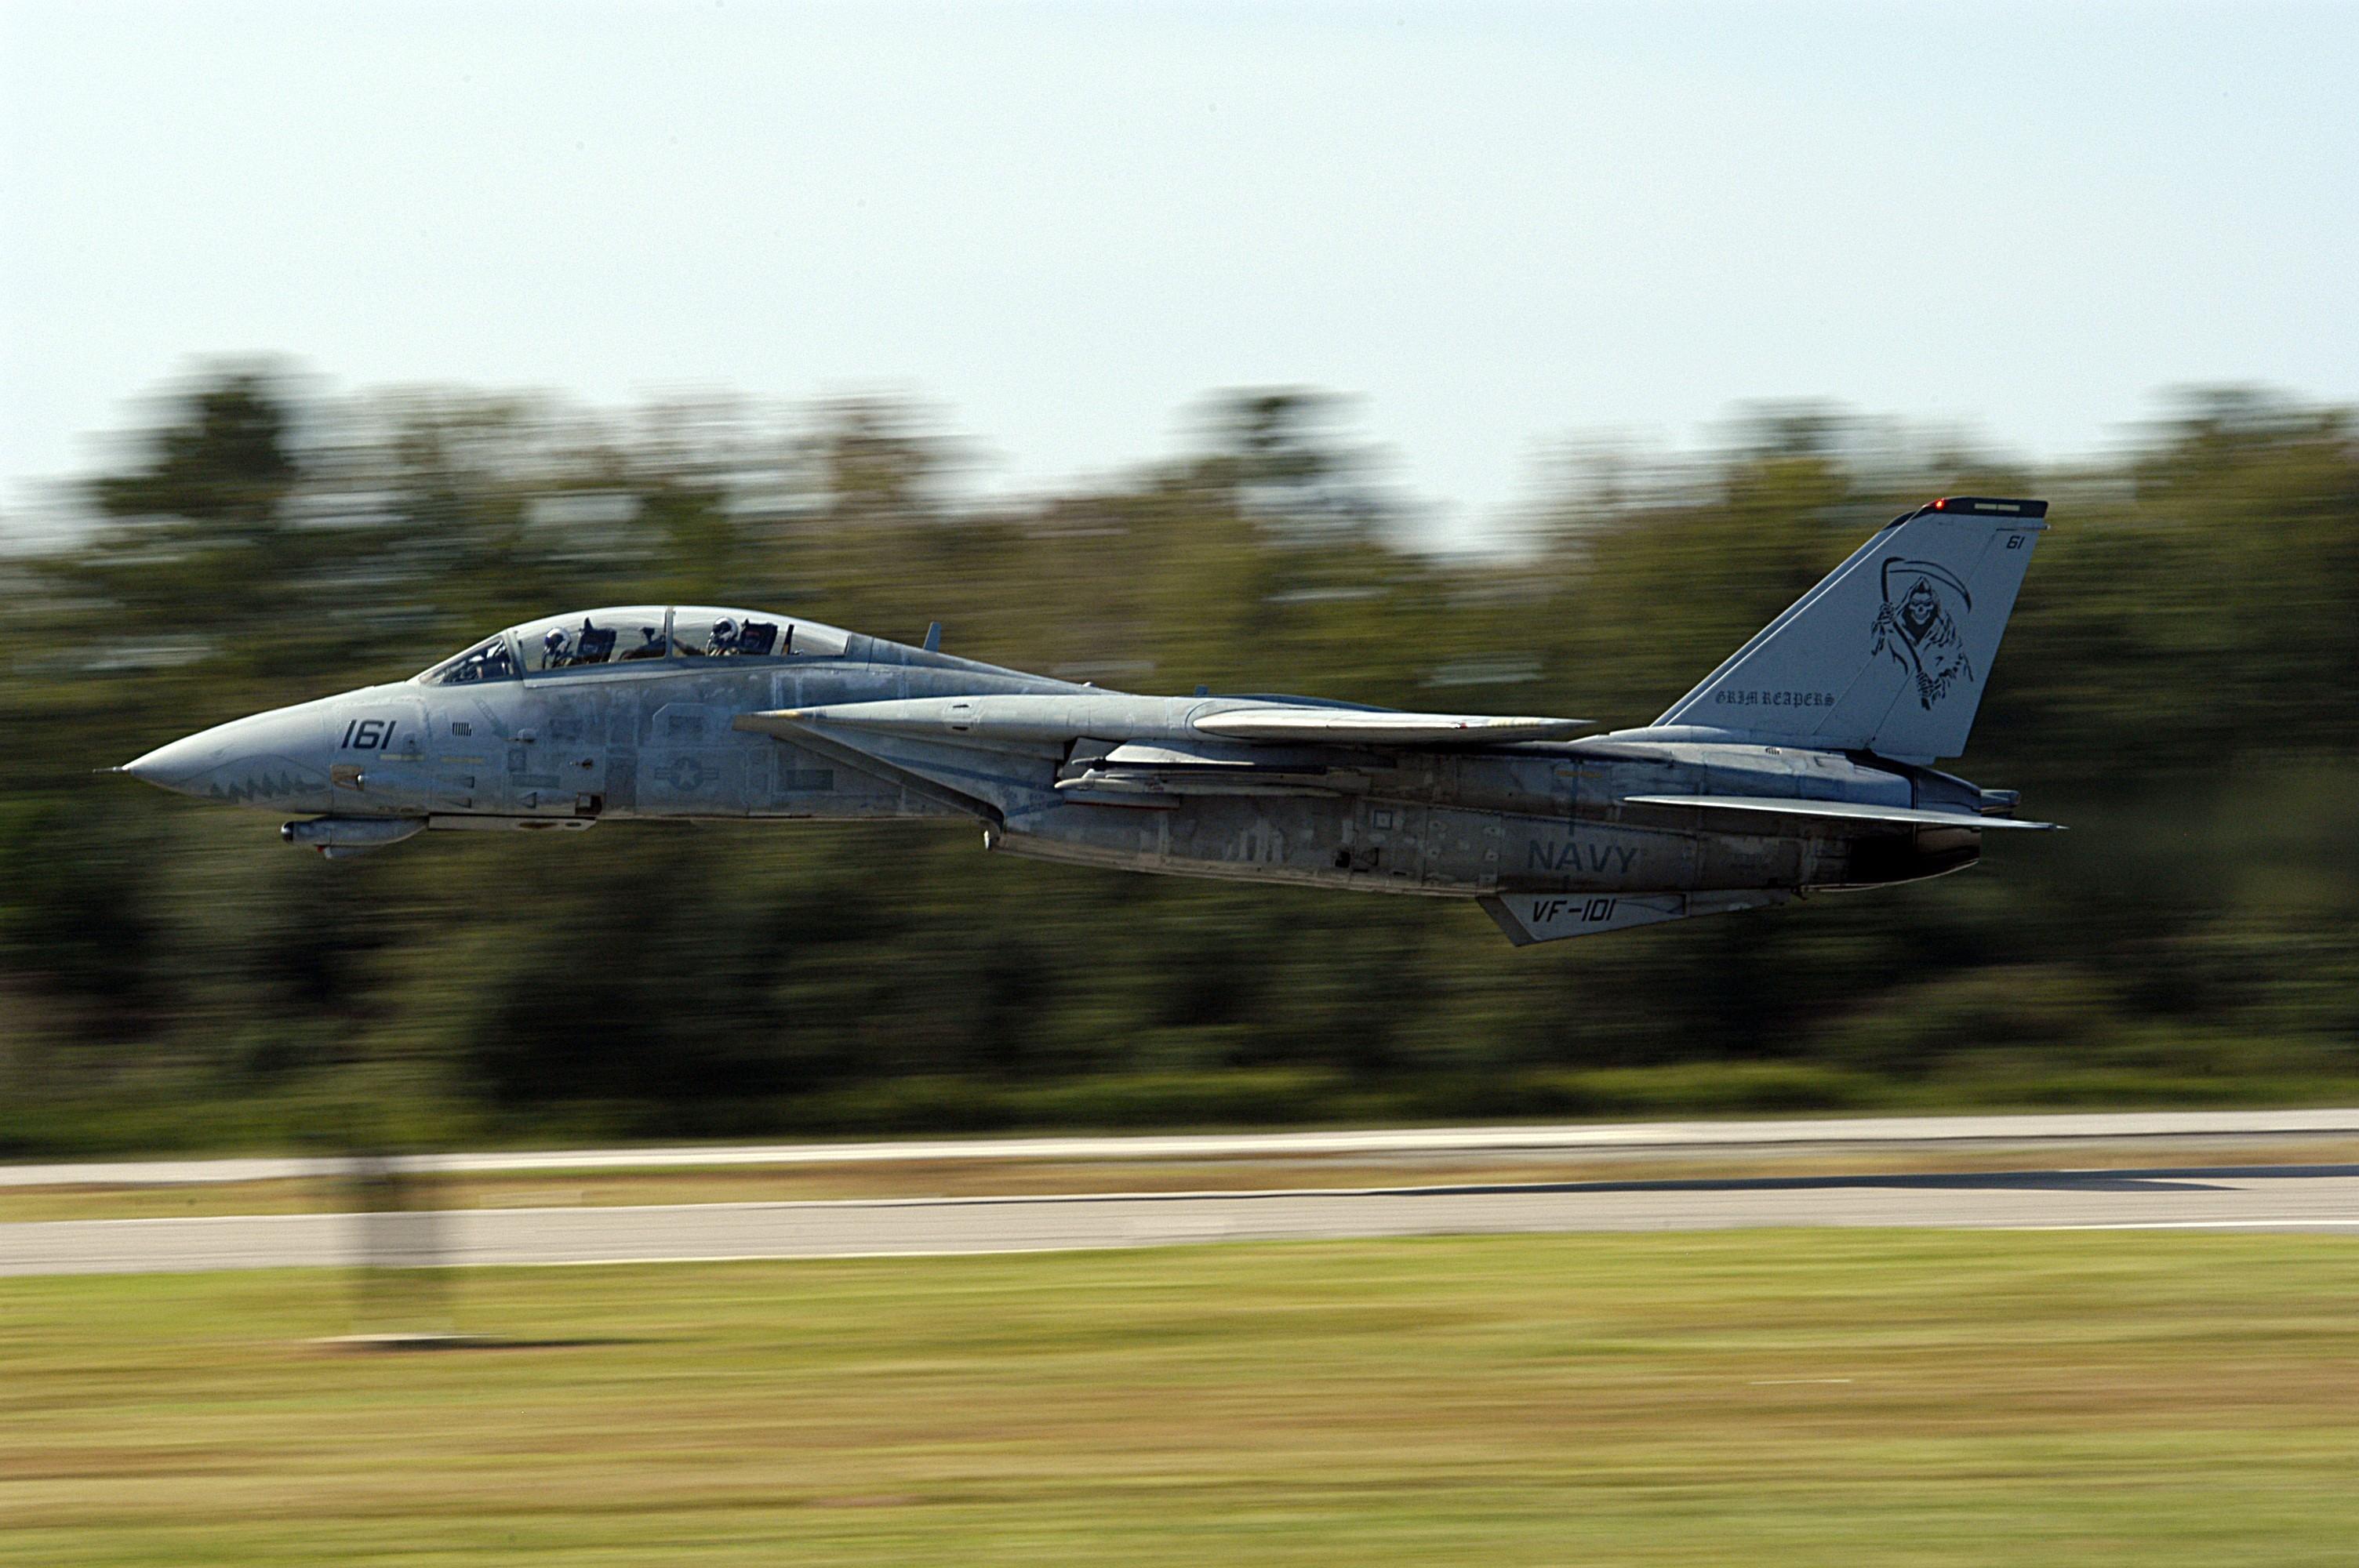 Res: 3008x2000, Military - Grumman F-14 Tomcat Wallpaper